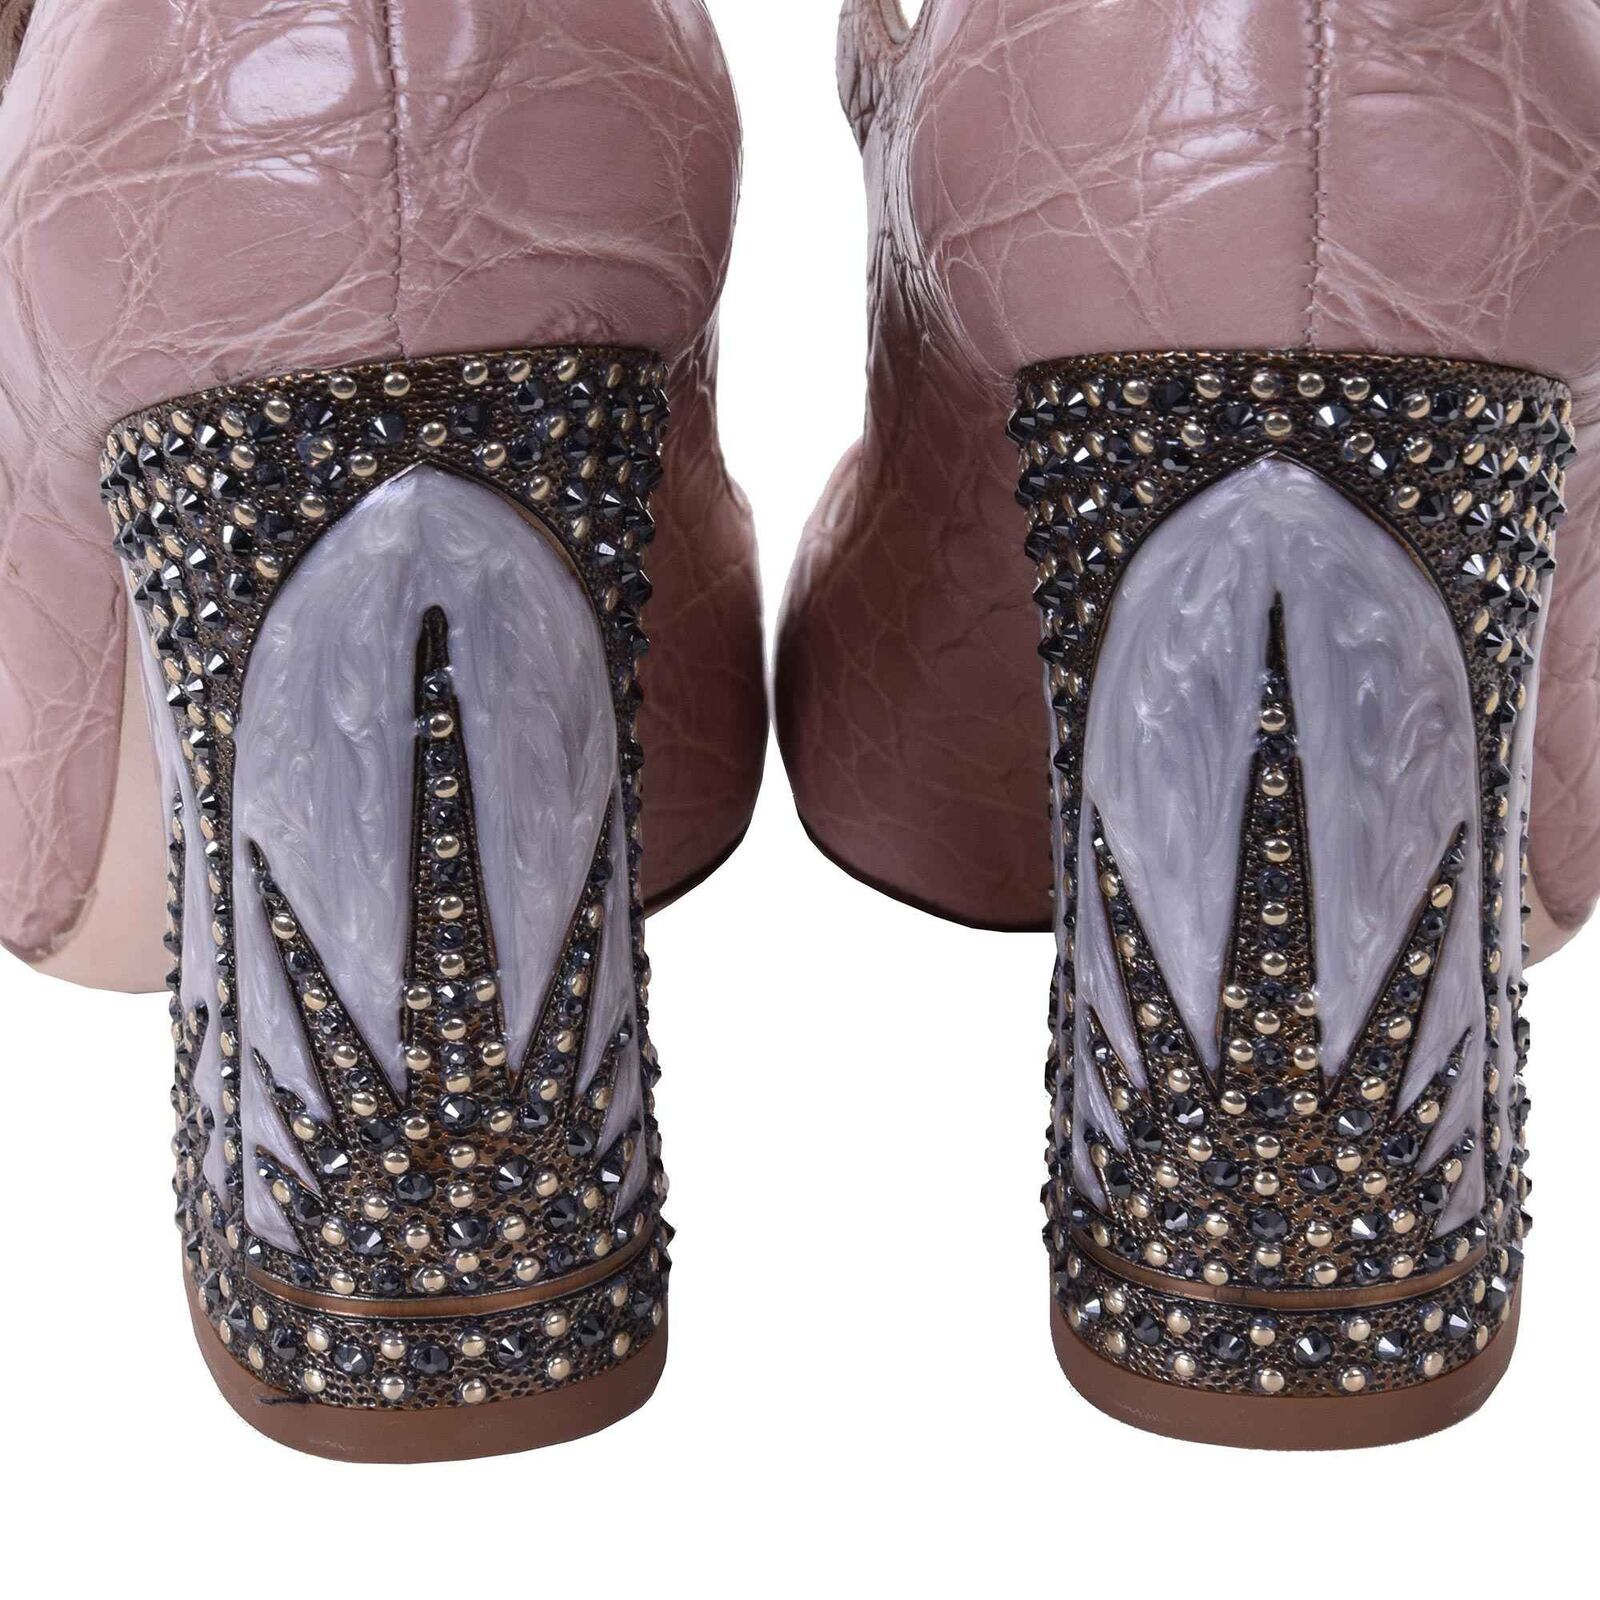 DOLCE & GABBANA Swarovski Krokodilleder Swarovski GABBANA Mary Jane Pumps Schuhe VALLY Nude 06705 574098